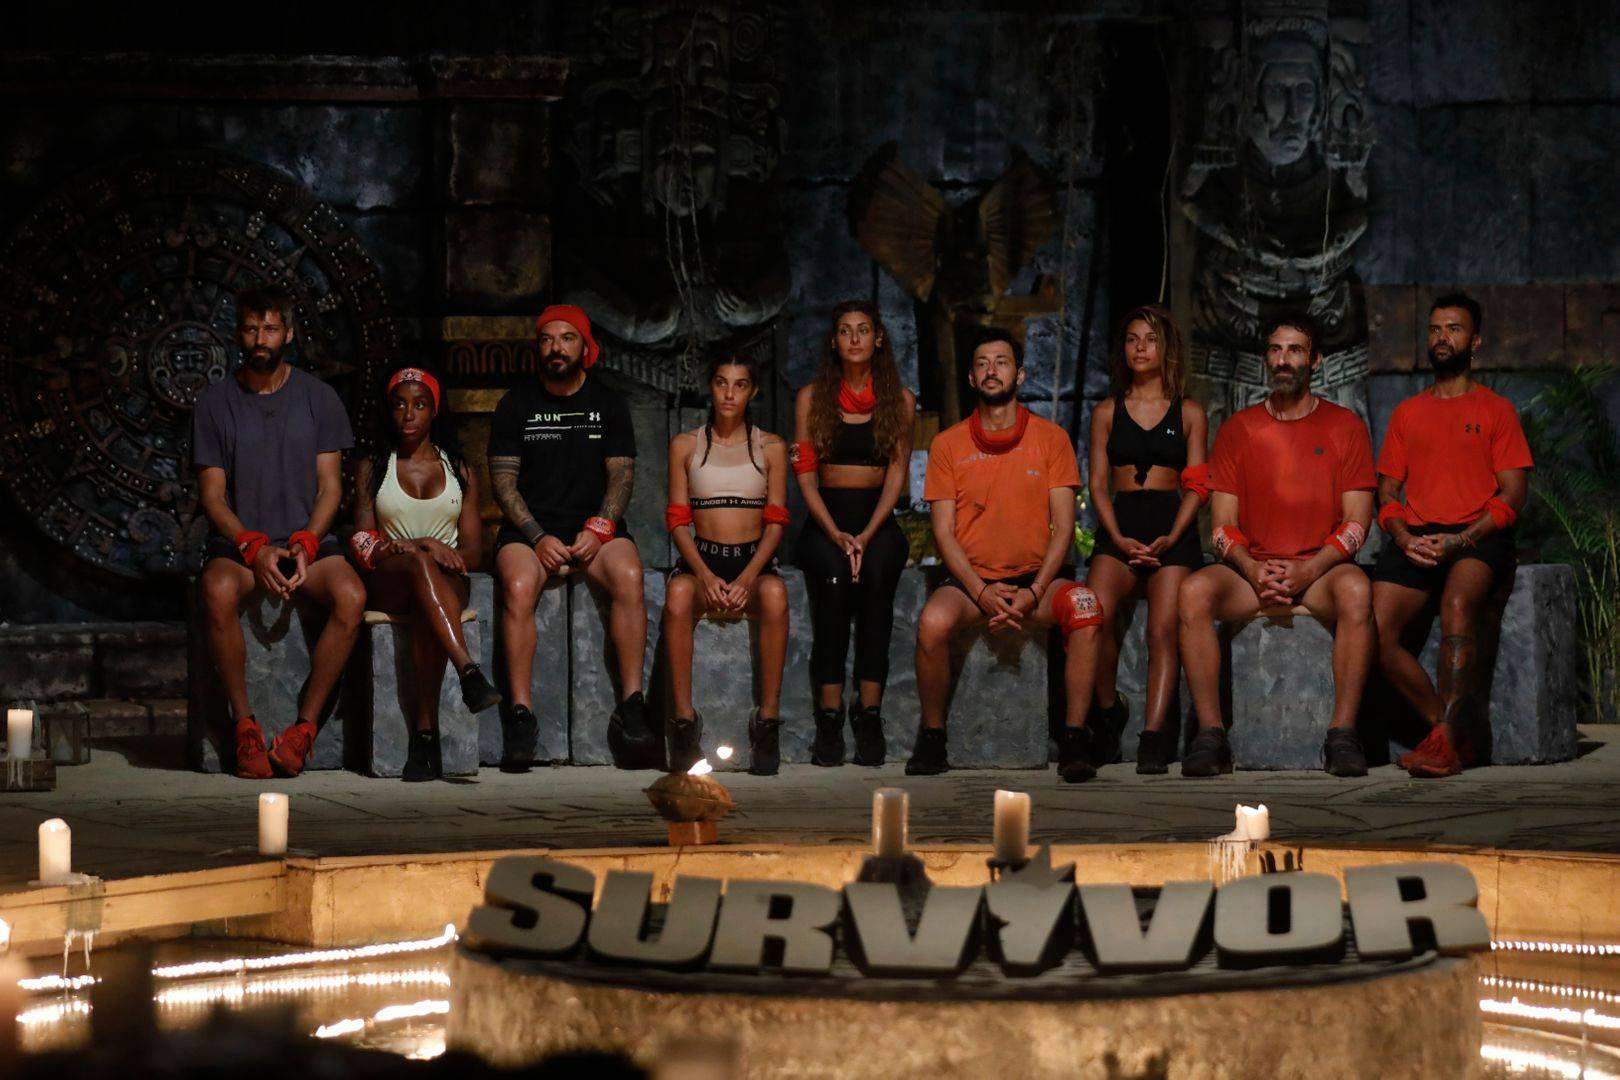 Survivor νέες ομάδες 18/1: Έτσι διάλεξαν τους νέους τους συμπαίκτες Τζέημς Καφετζής και Γιώργος Κοψιδάς!